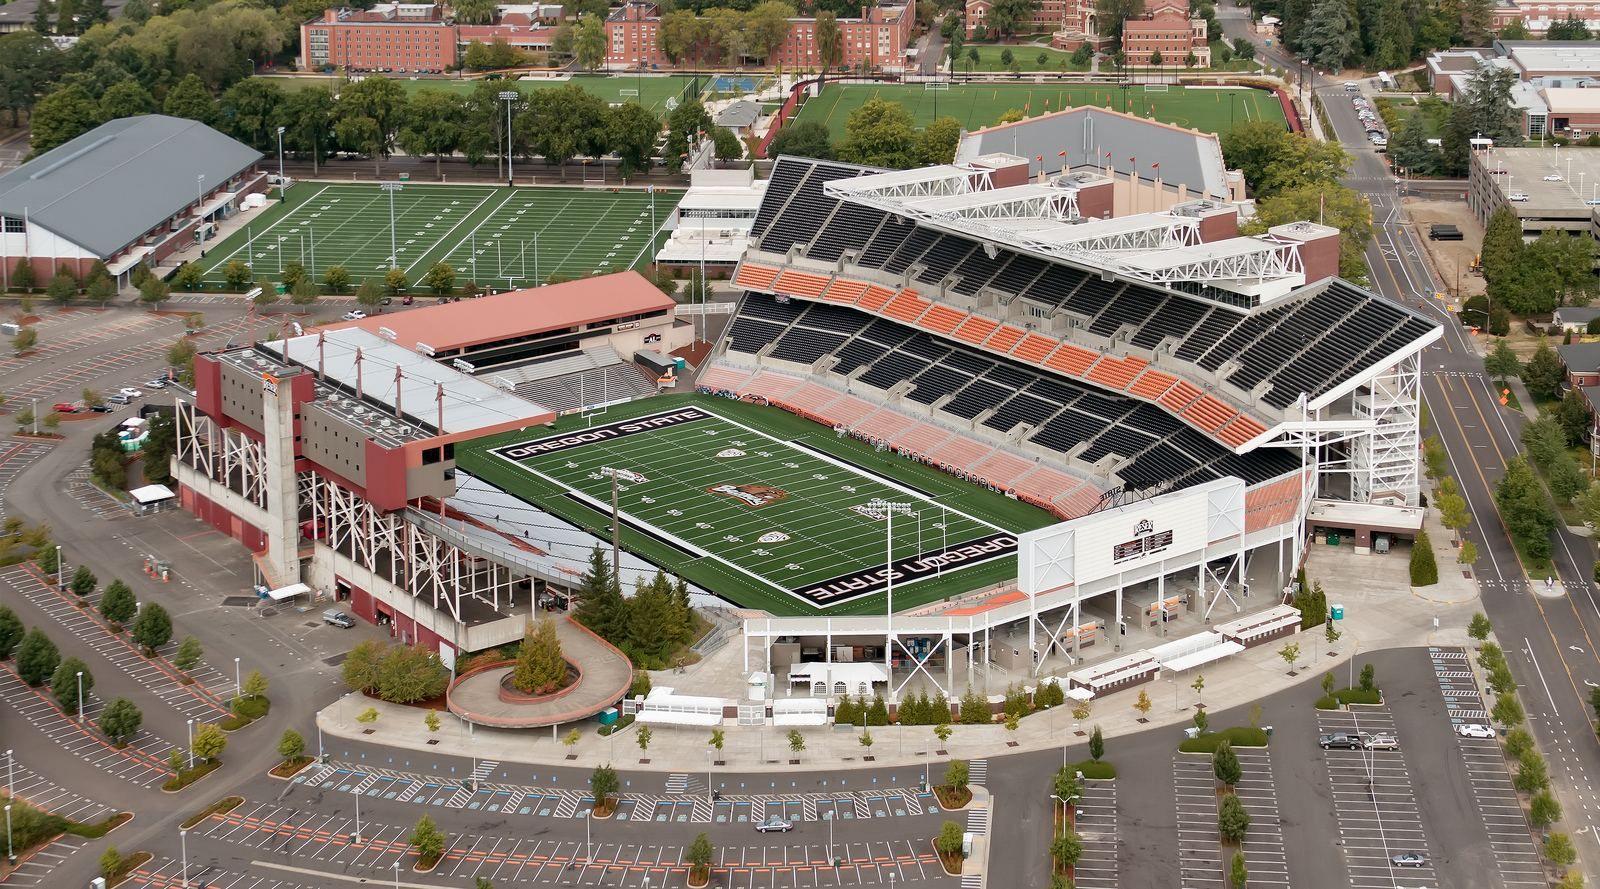 Reser Stadium Oregon State University Corvallis Or Oregon State University Oregon State Beavers Oregon State